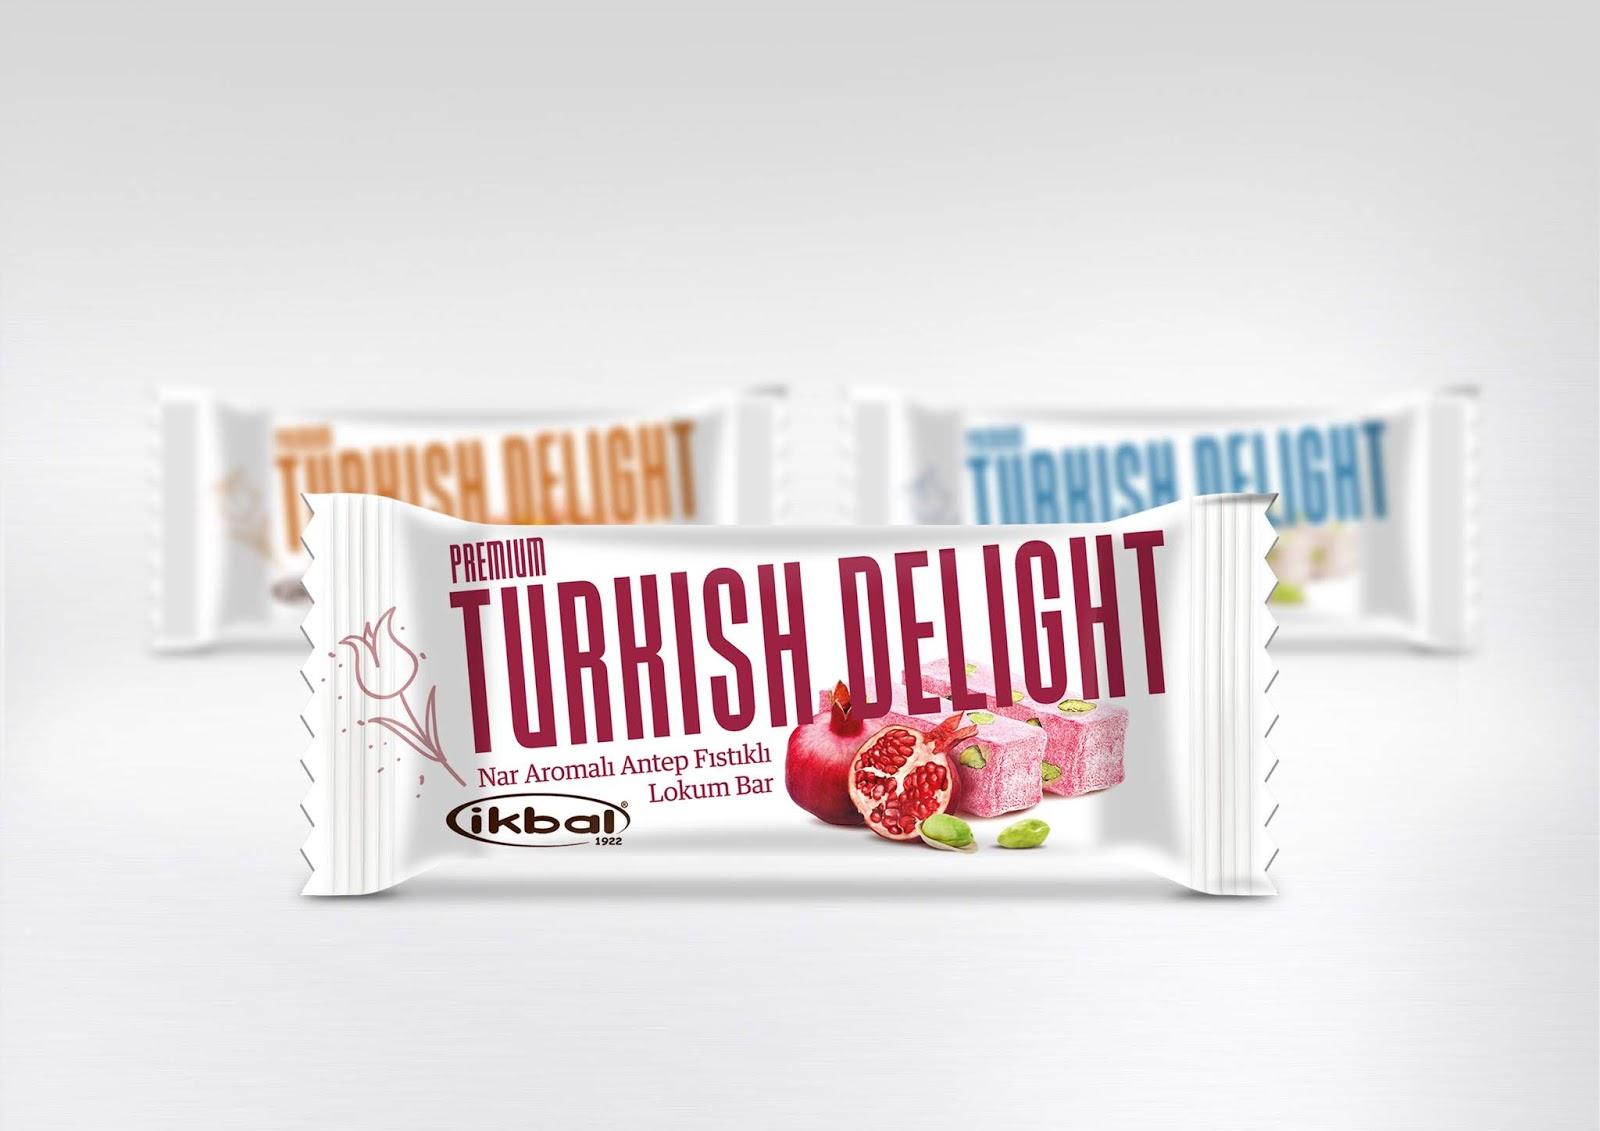 Premium Turkish Delight Bar Packaging Design